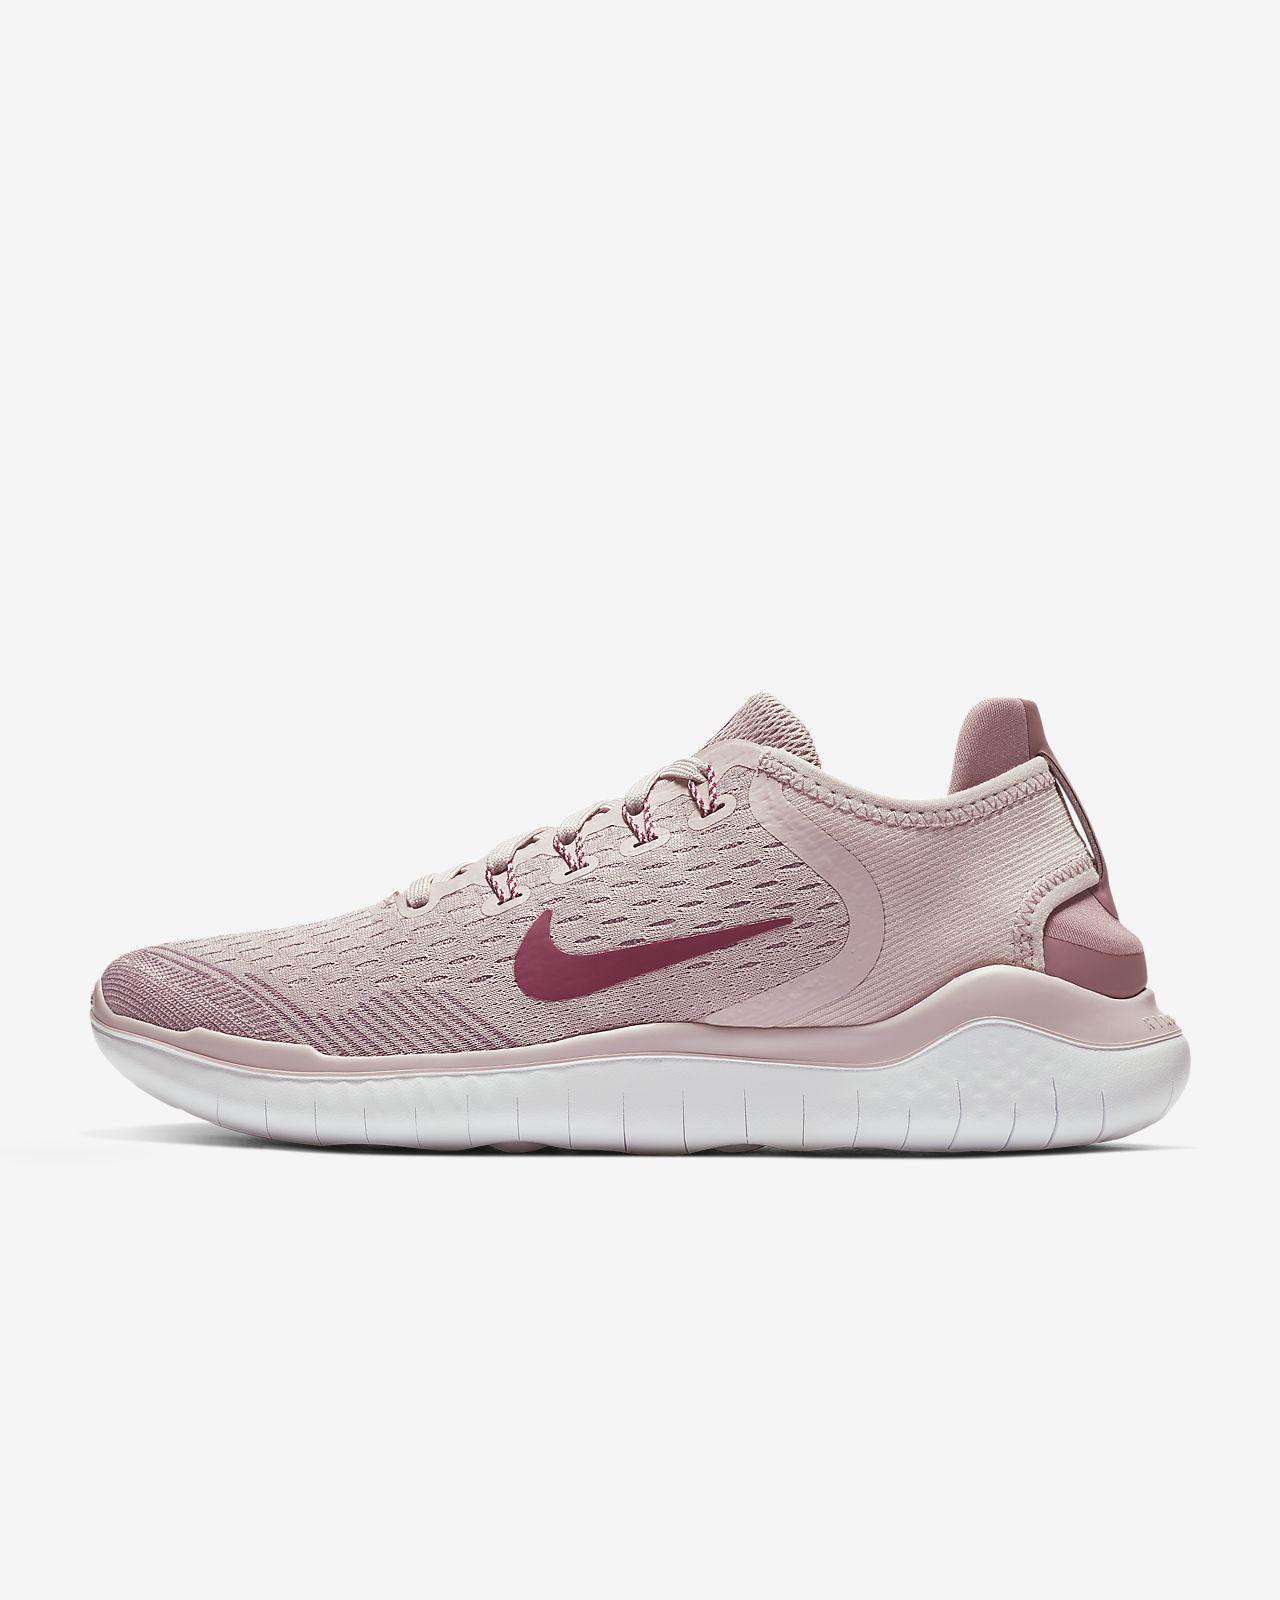 5c9d50dbe31974 Nike Free RN 2018 Women s Running Shoe. Nike.com CA